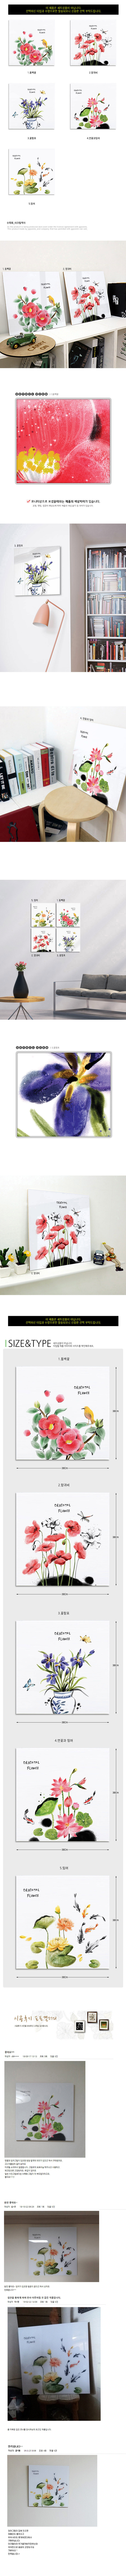 cm690-아크릴액자_수묵화 - 꾸밈, 25,600원, 홈갤러리, 사진아트